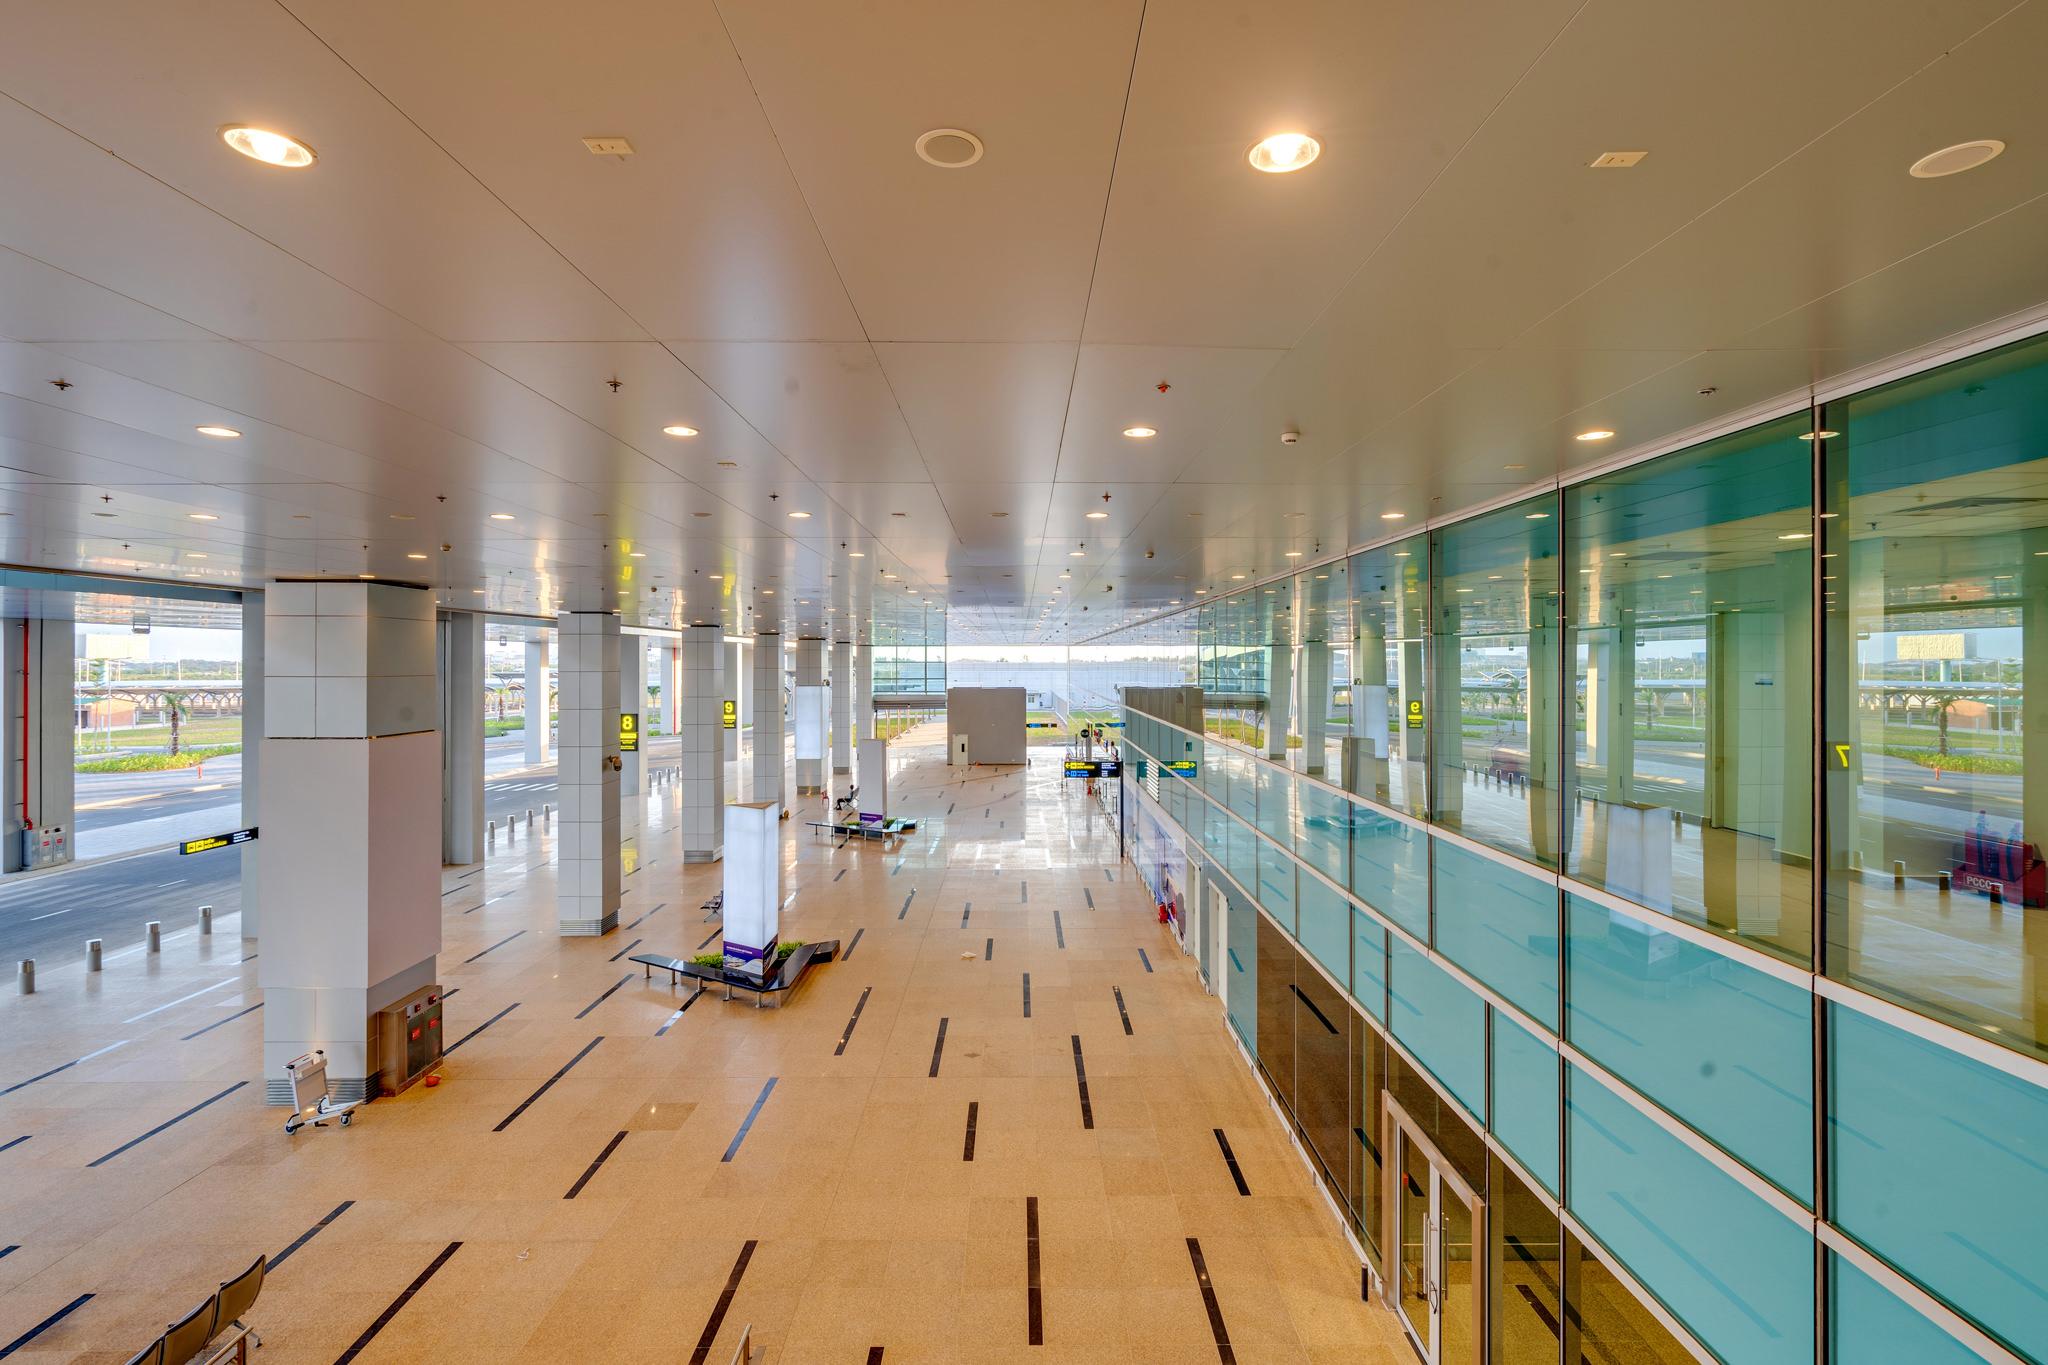 20180626 - Cam Ranh Airport - Architecture - 0049.jpg